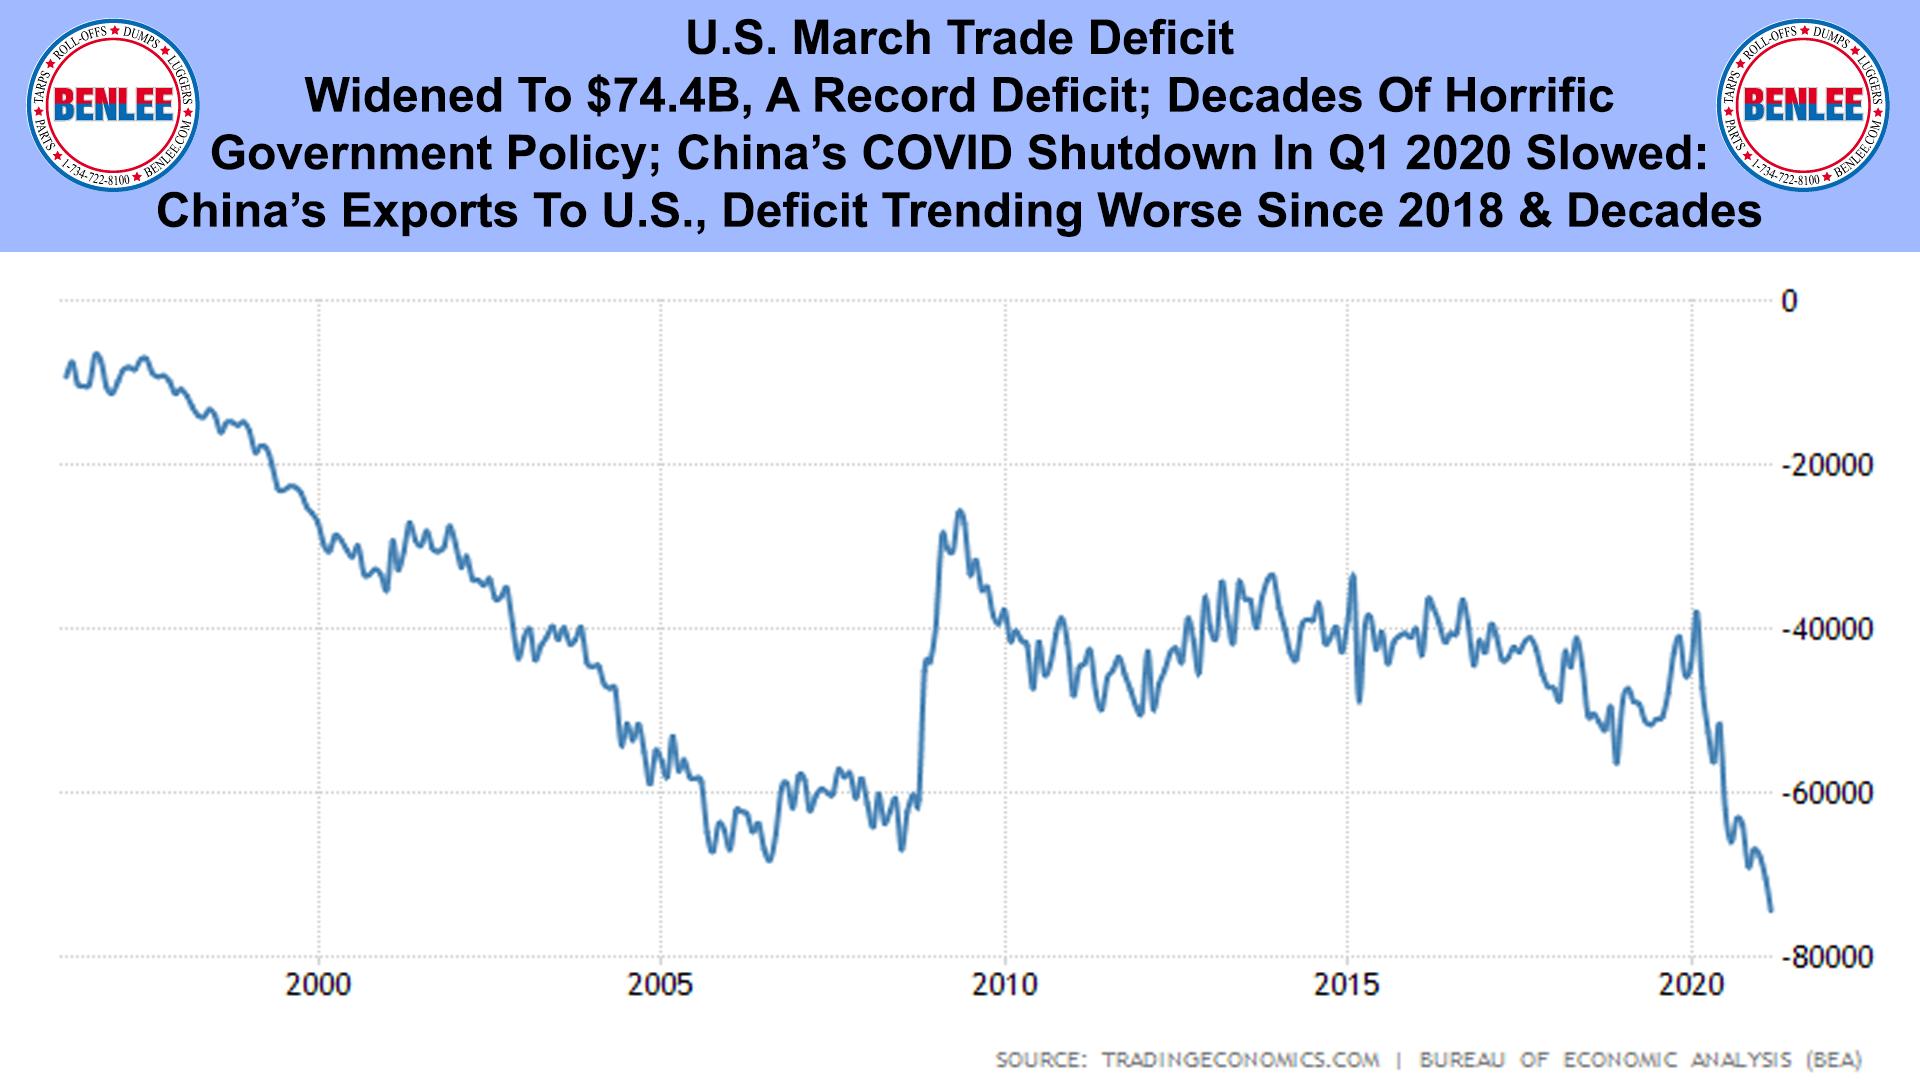 U.S. March Trade Deficit